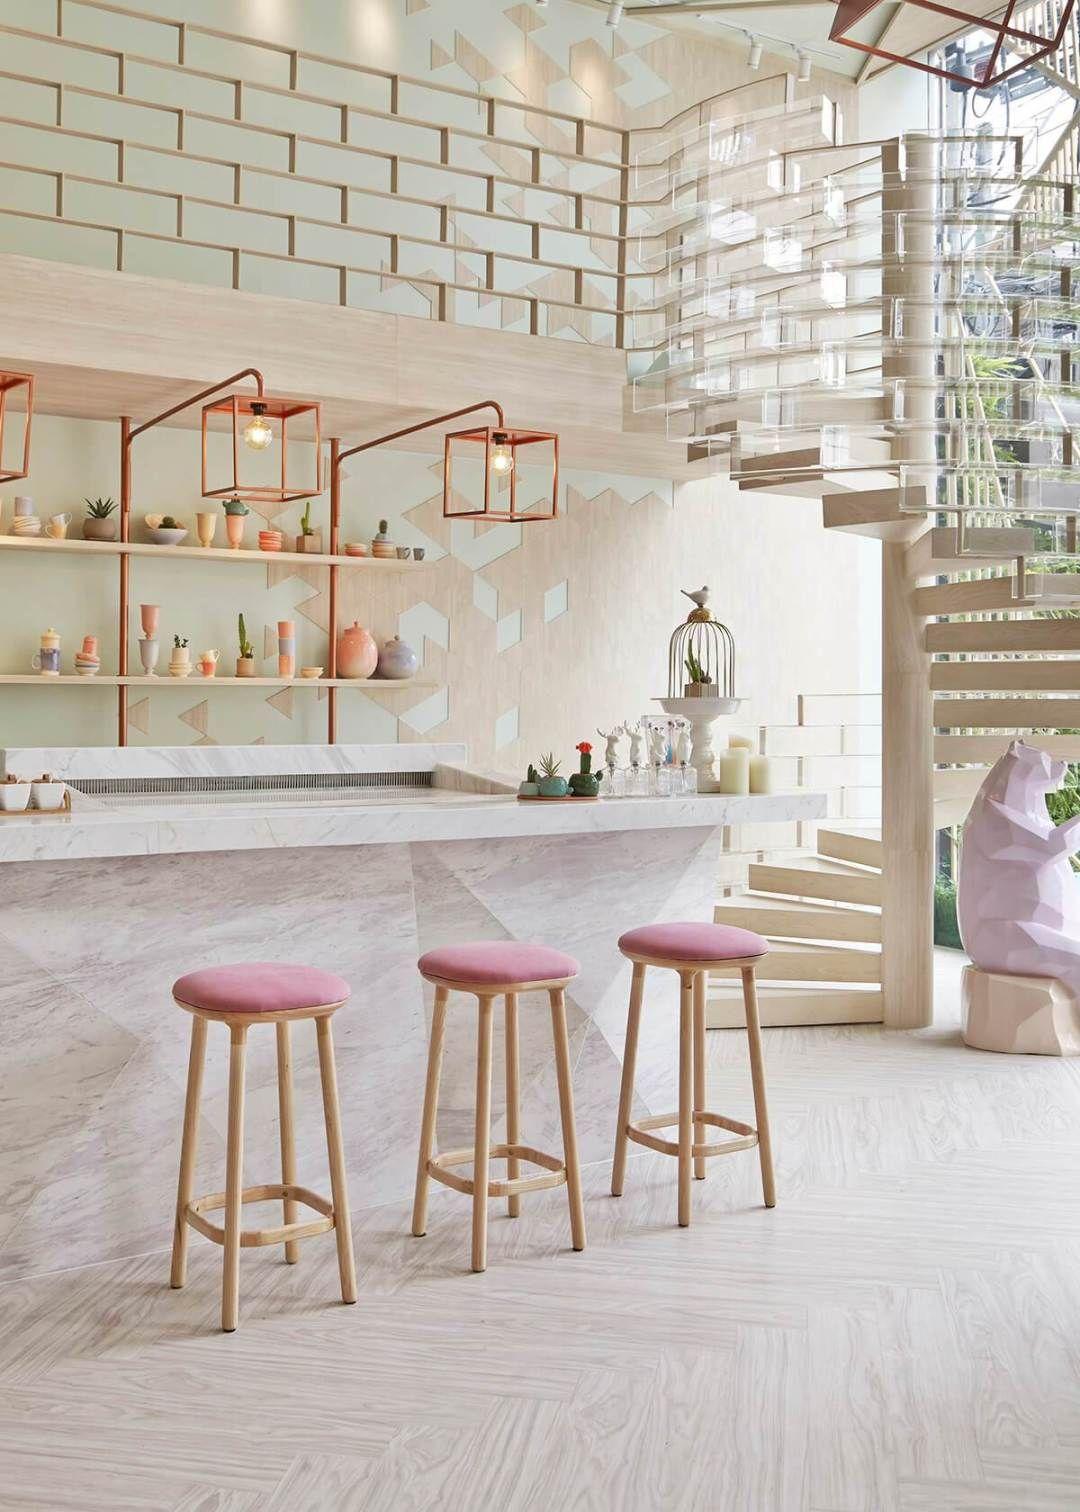 Homedecor Home Decor Rosegold Pink Grey Pastel Pink Grey And Rose Gold Interior De In 2020 Gold Interior Design Rose Gold Interior Design Open Kitchen Interior